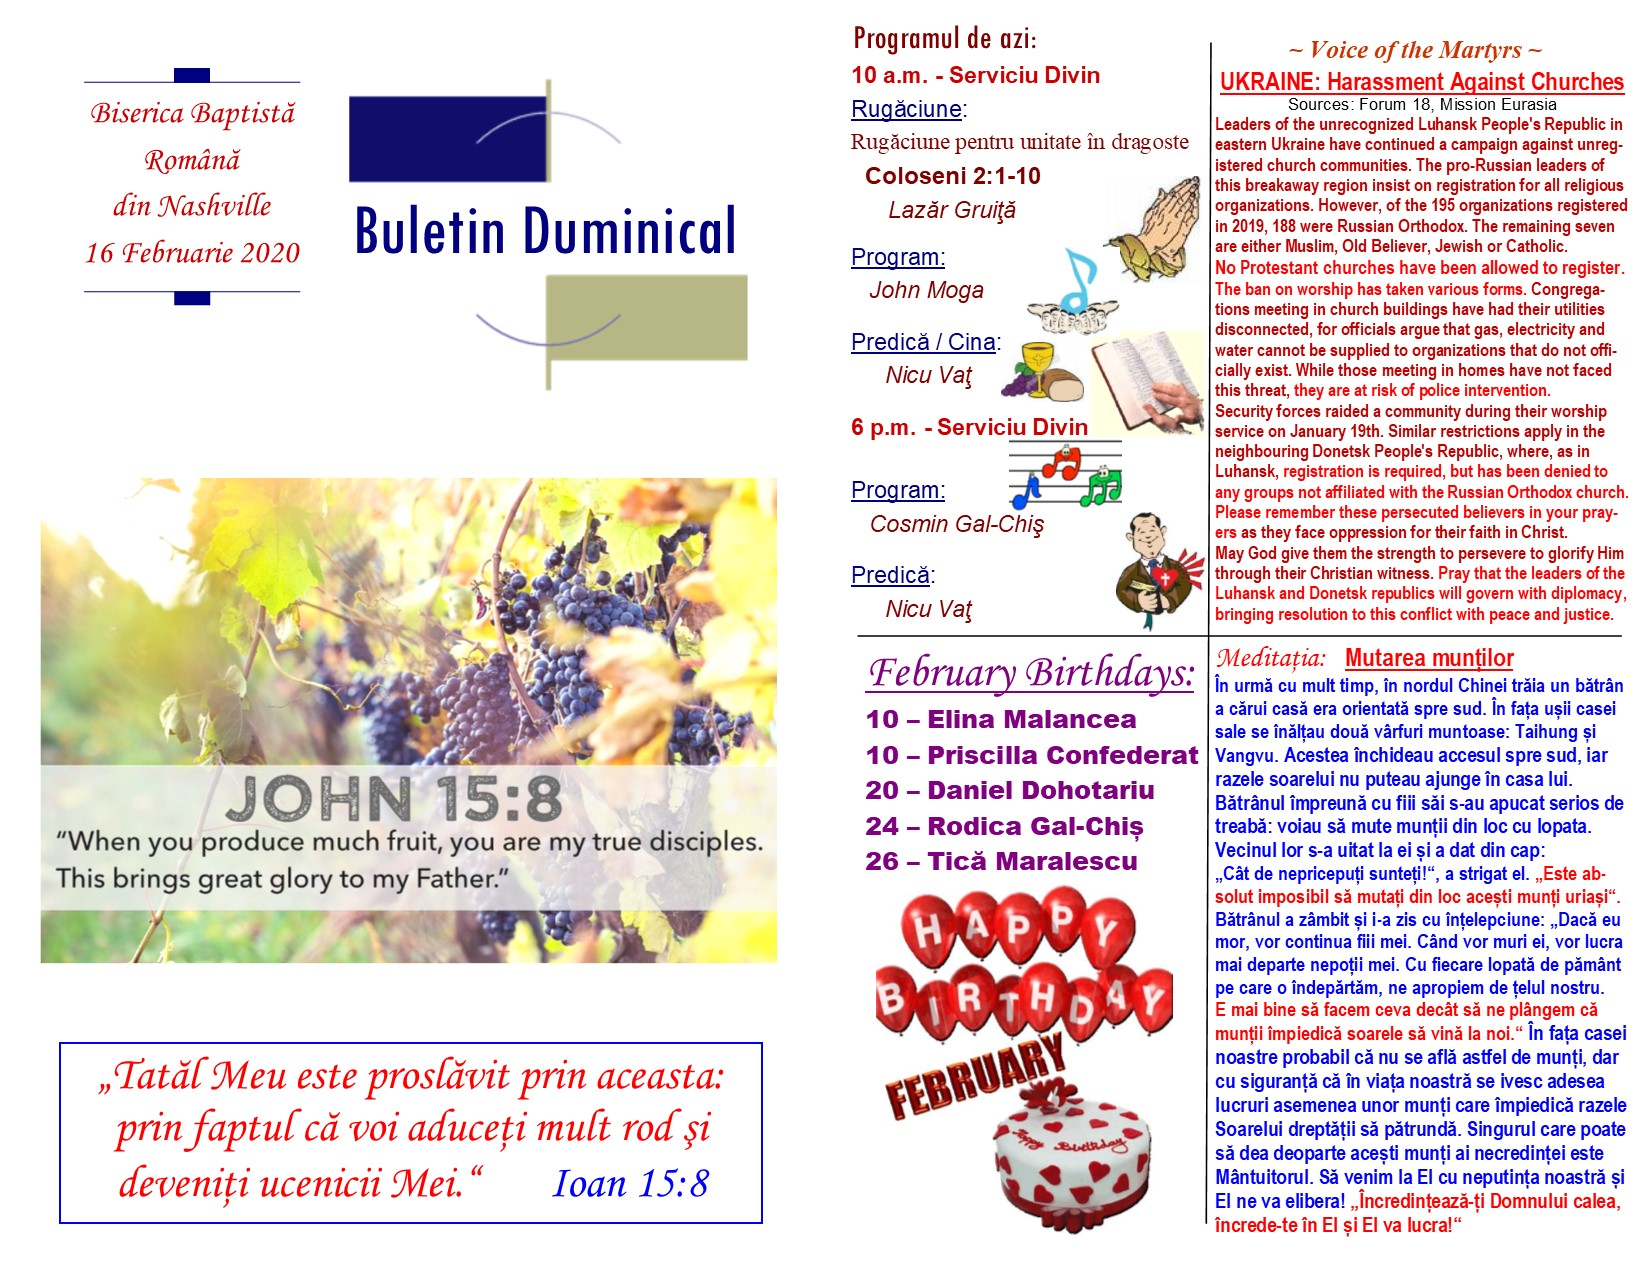 Buletin 02-16-20 page 1 & 2